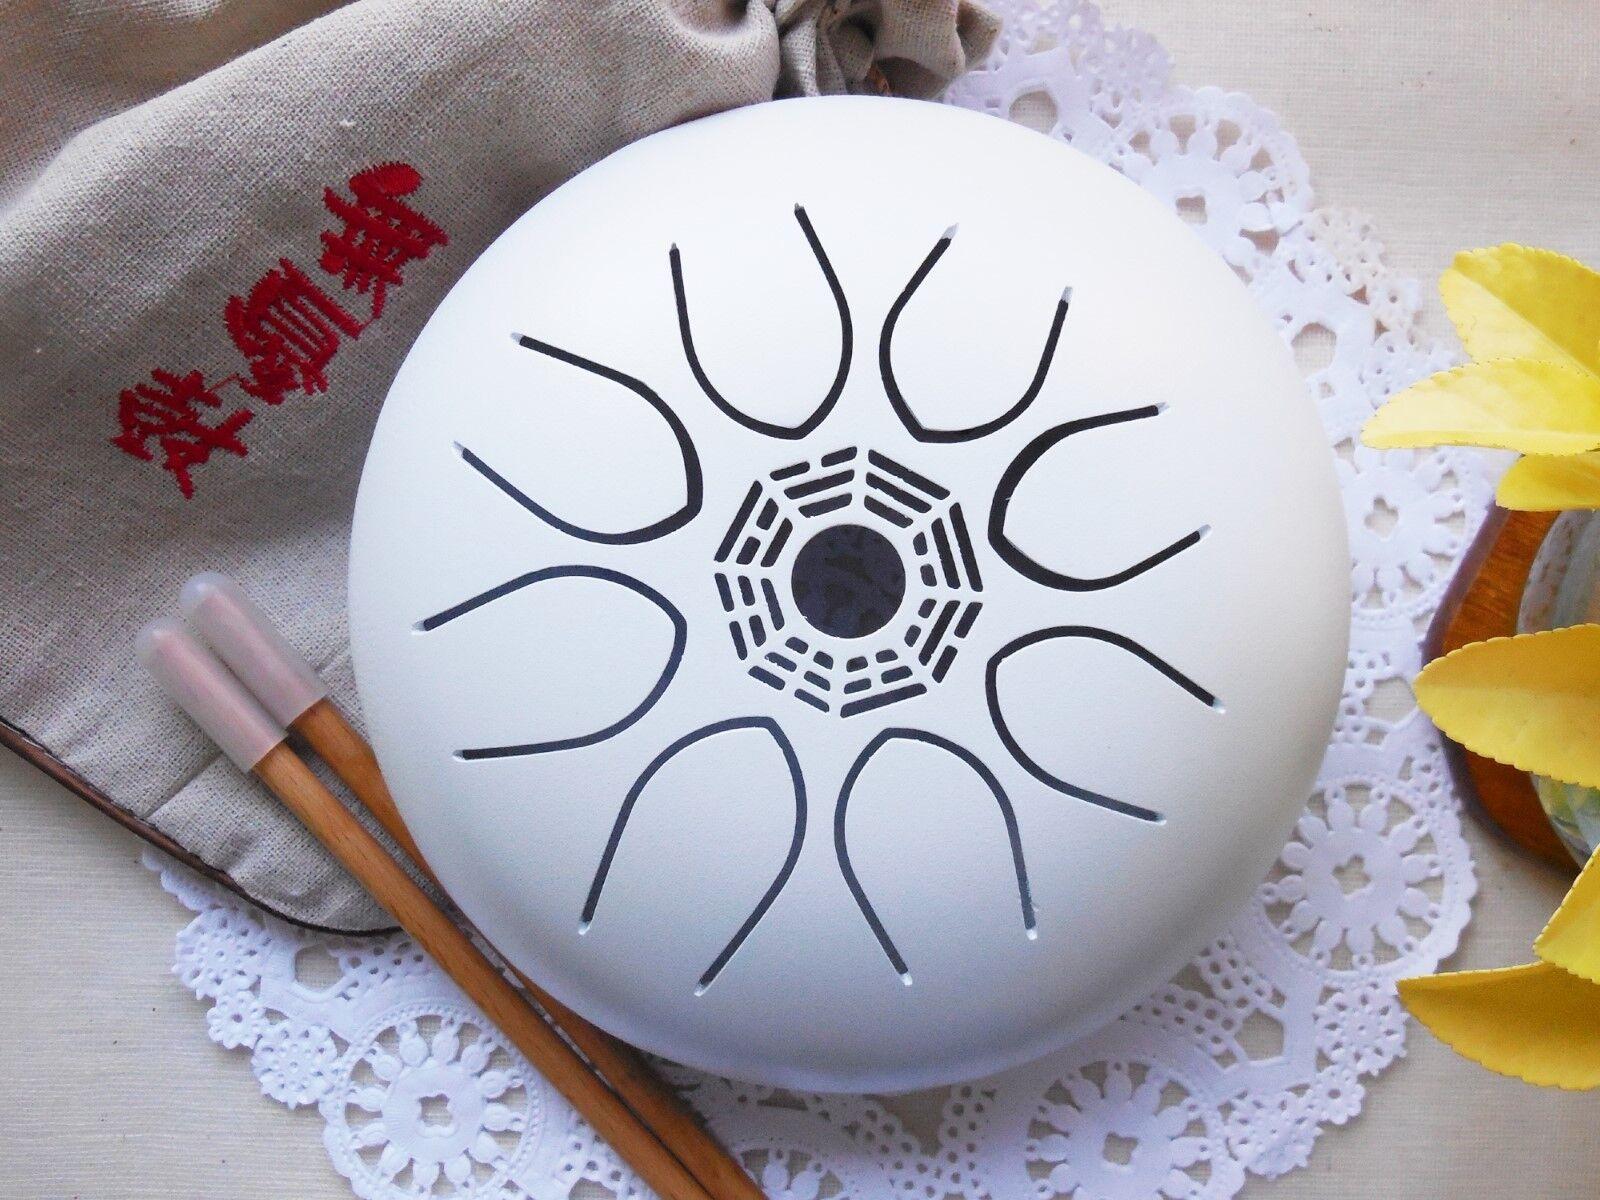 WuYou Tai  Bagua 7  16cm Steel Tongue Drum Handpan, Reiki Boost and healing